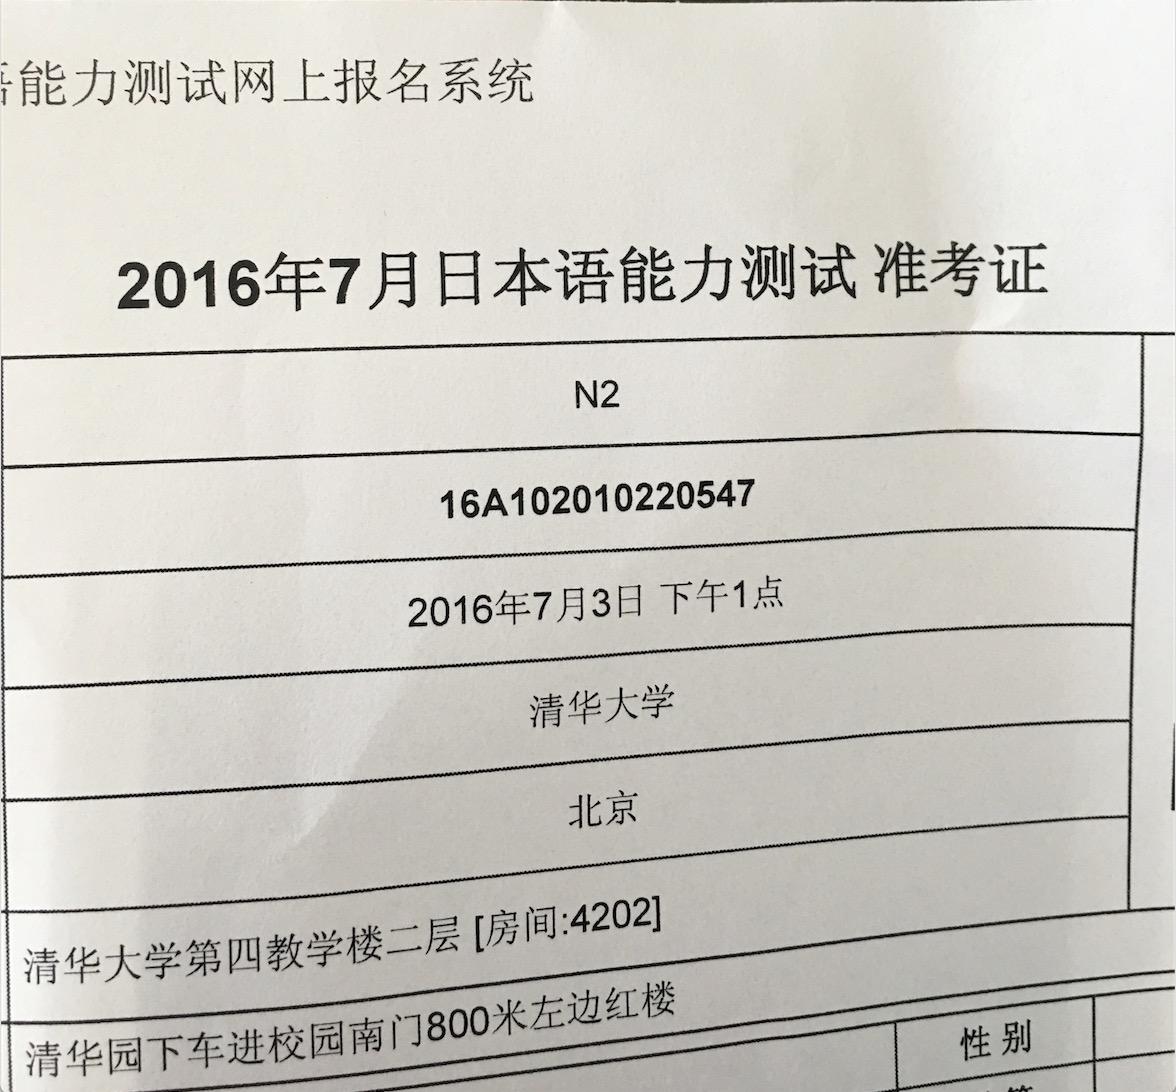 N2 准考证